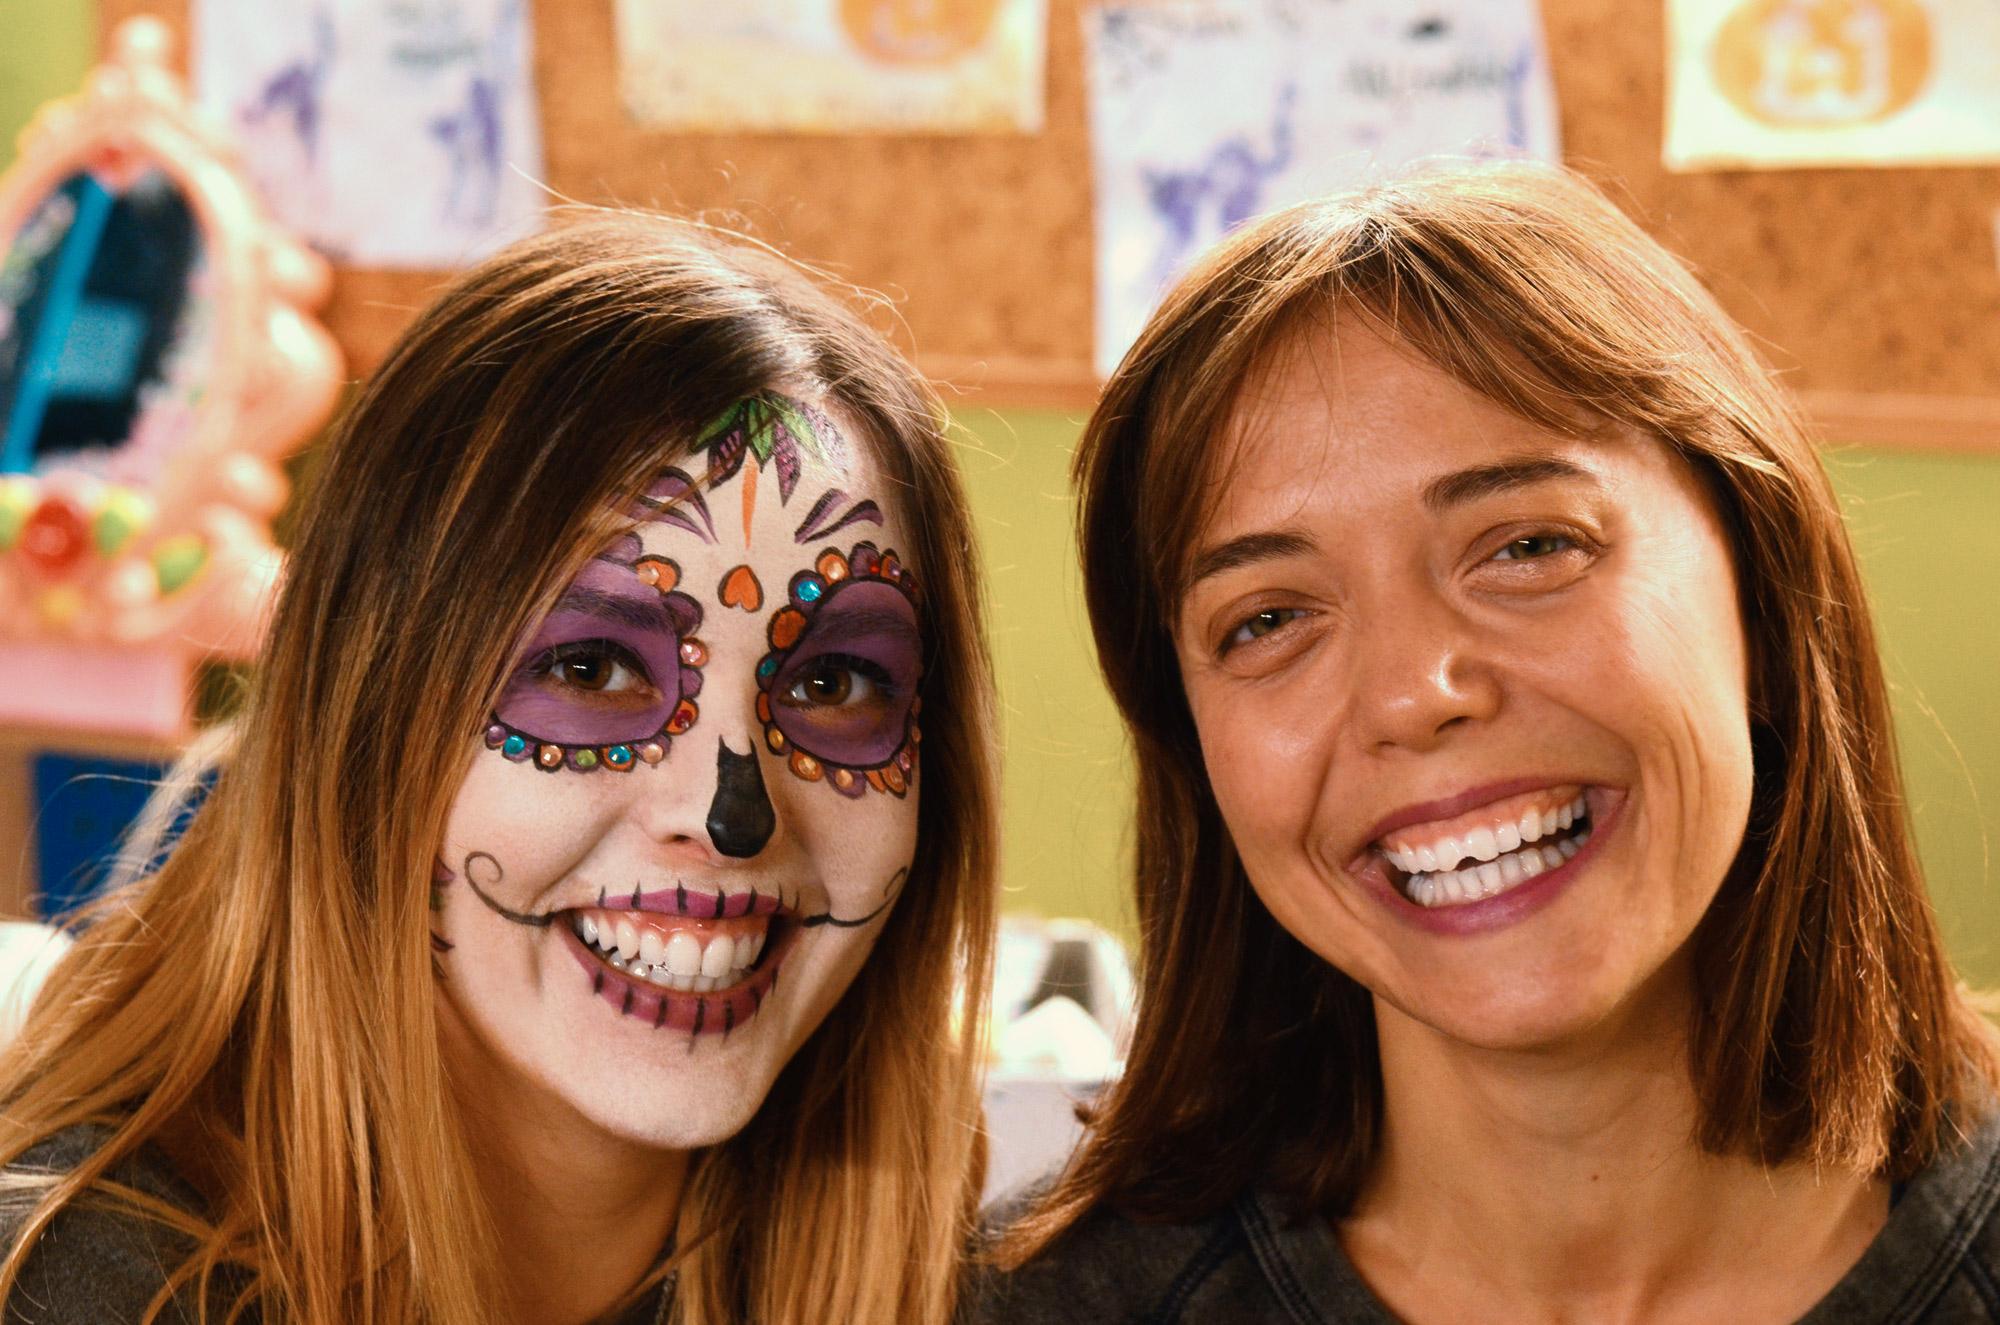 face-painting-kolorami-federica-crocetti